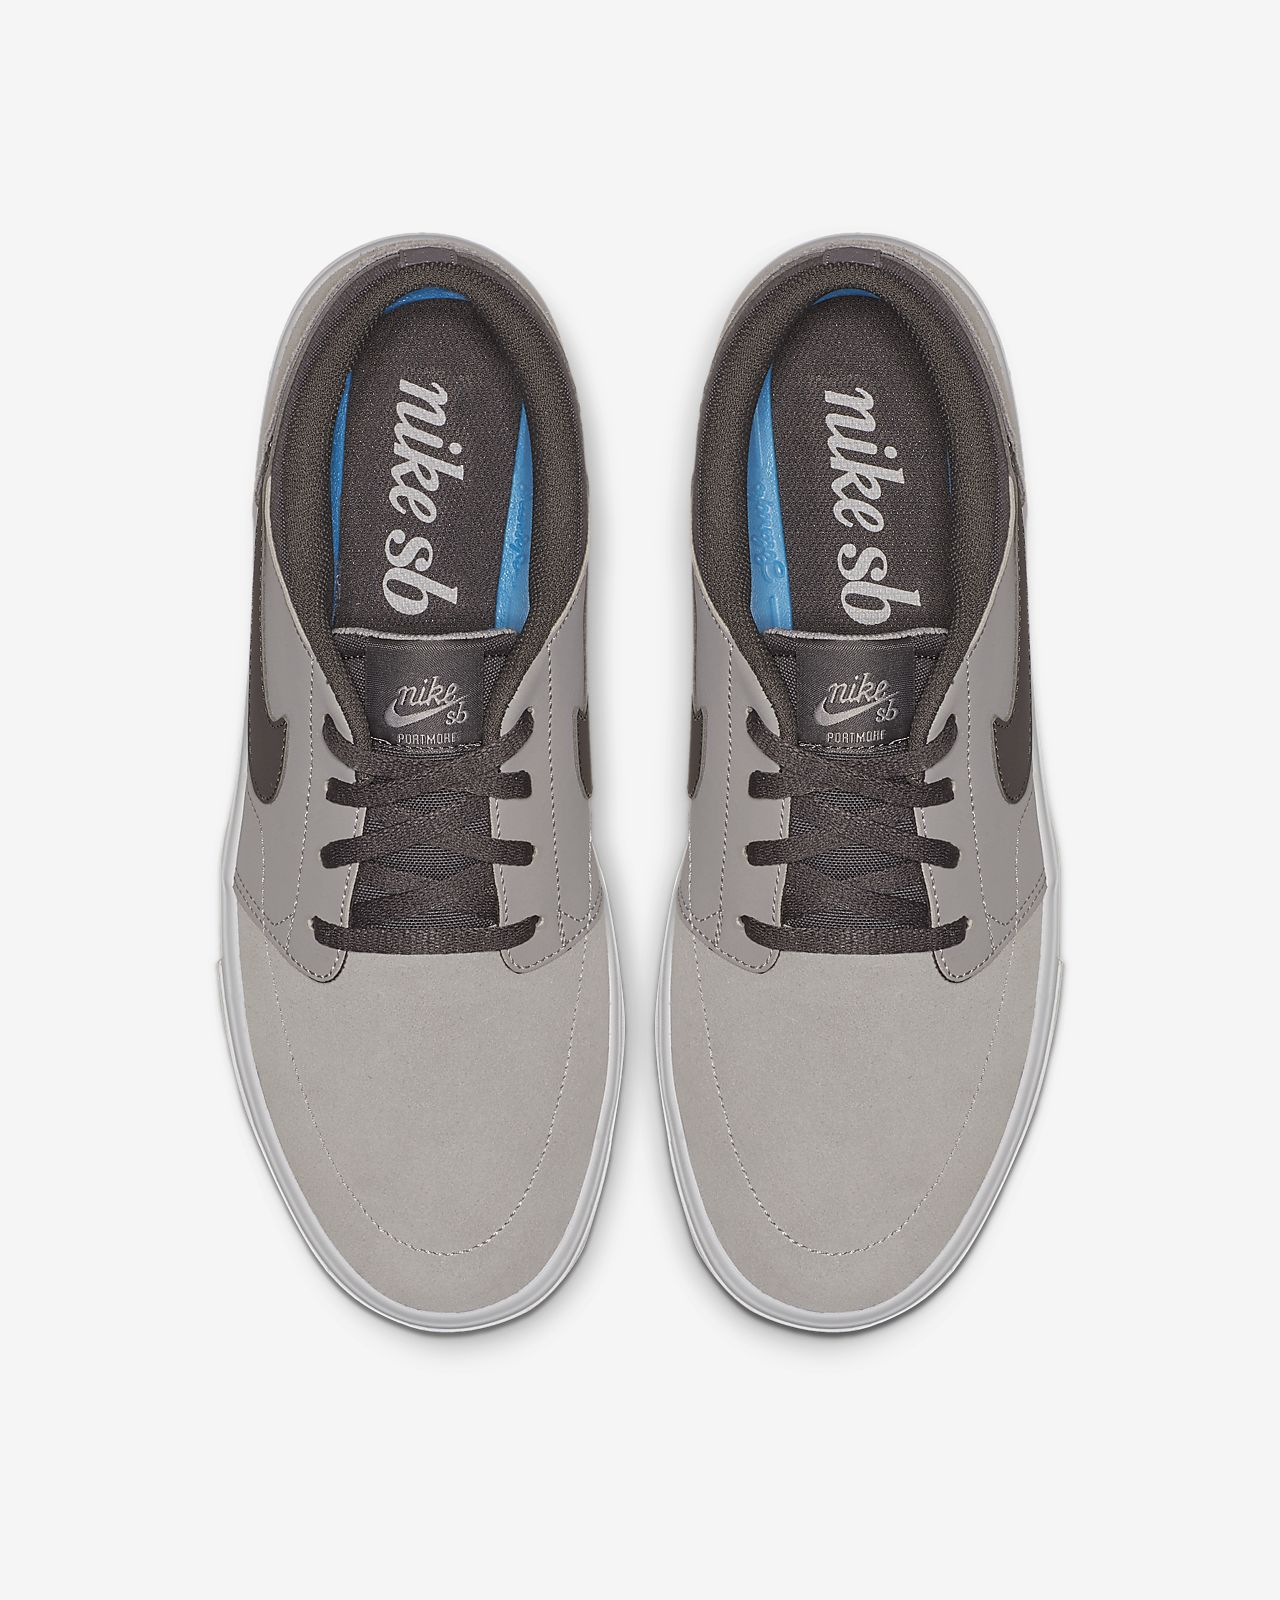 designer fashion c6b2e 71dba Nike SB Solarsoft Portmore II Herren-Skateboardschuh. Nike.com AT